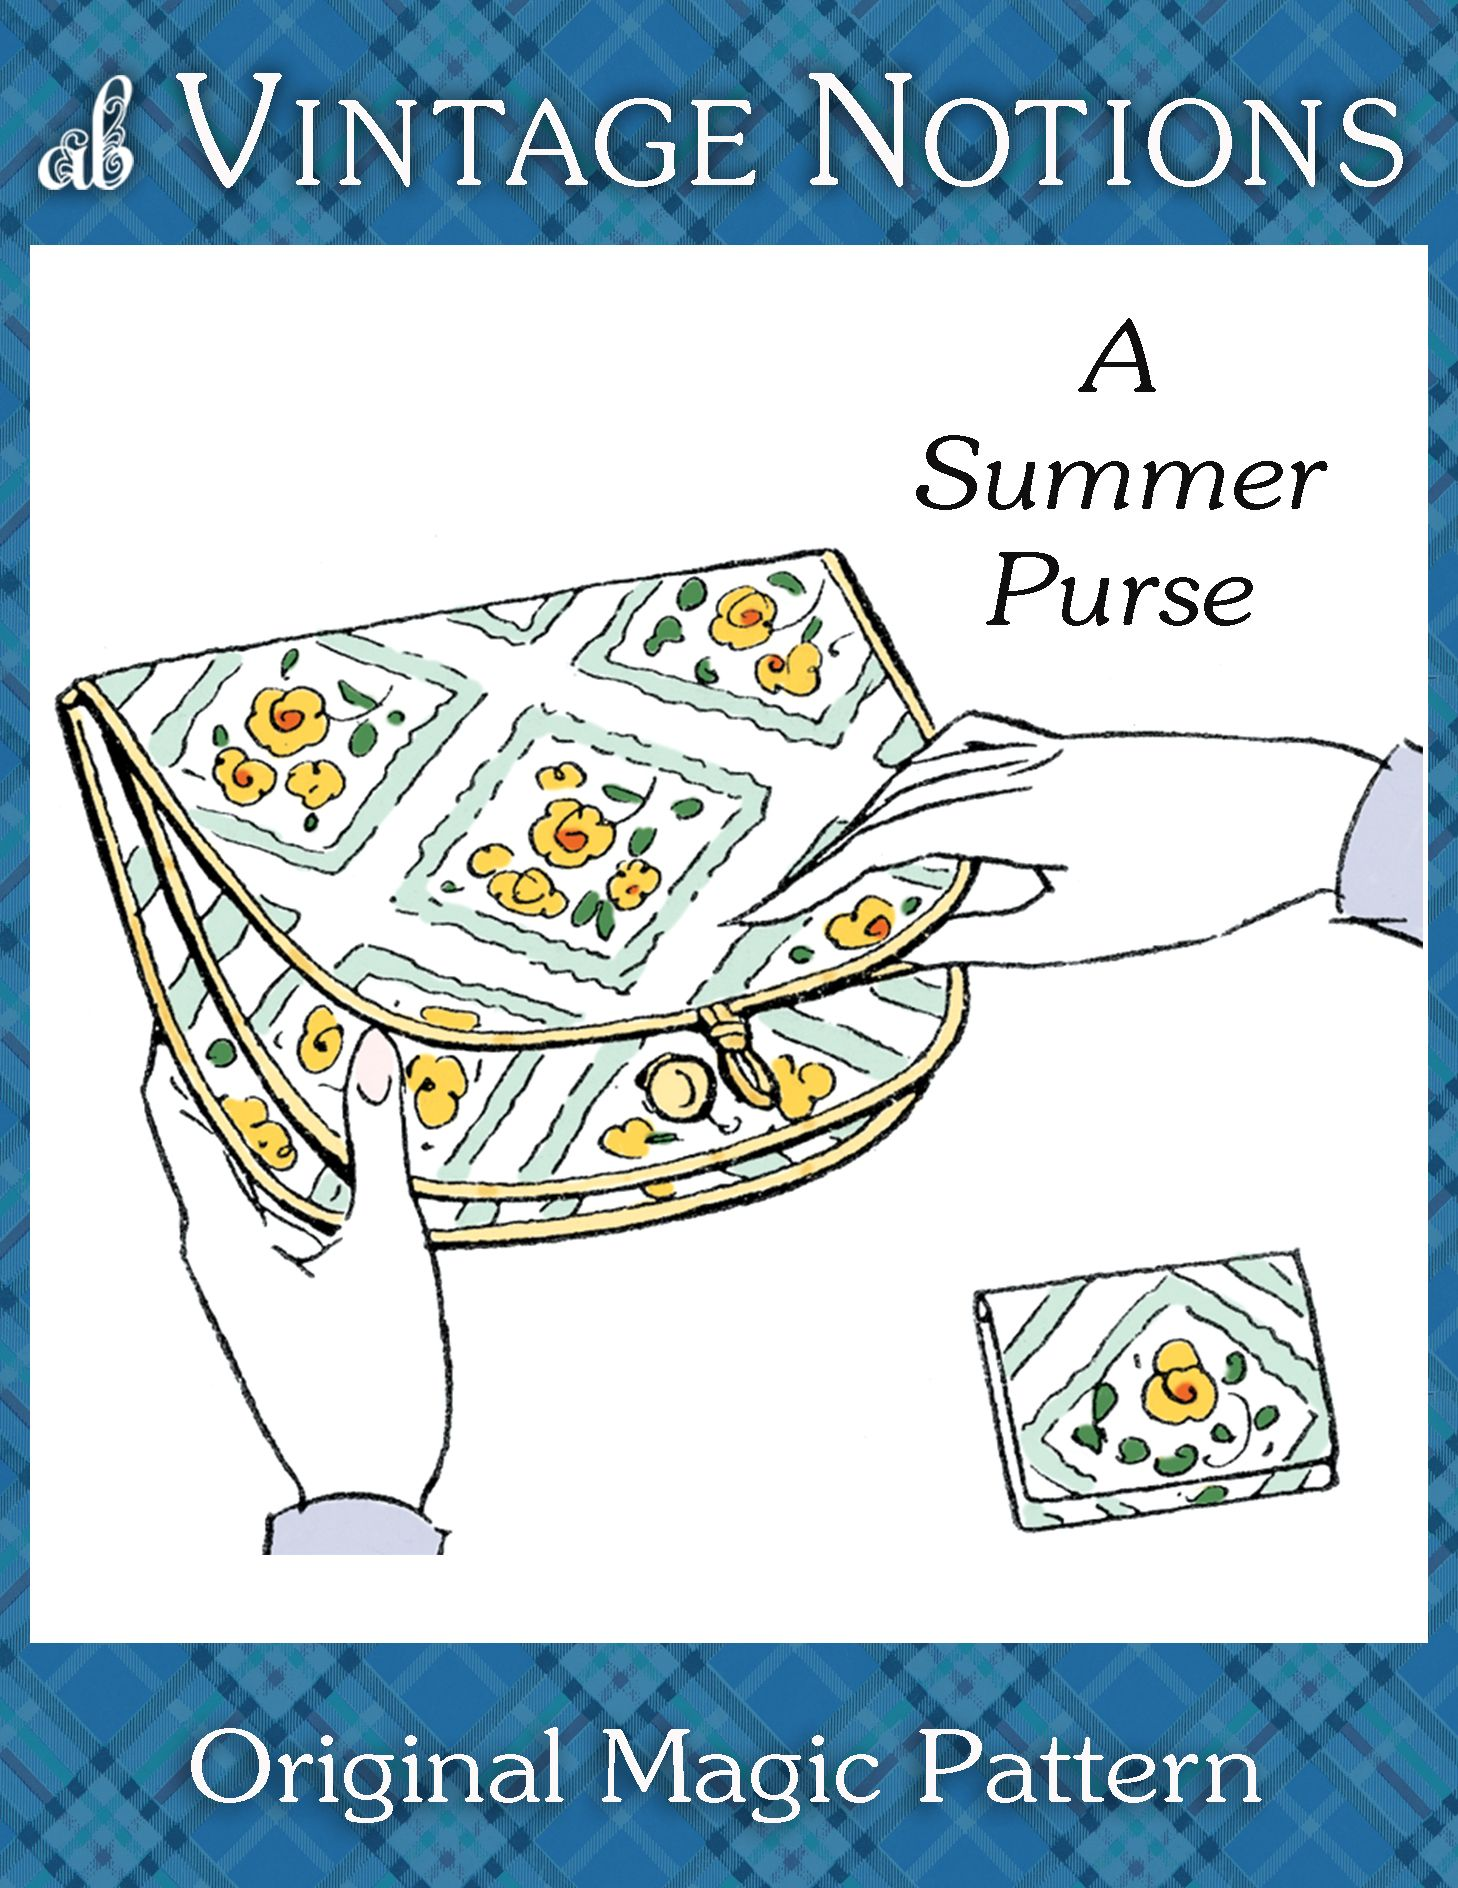 Vintage Notions Summer Purse INSTANT DOWNLOAD | Amybarickman.com